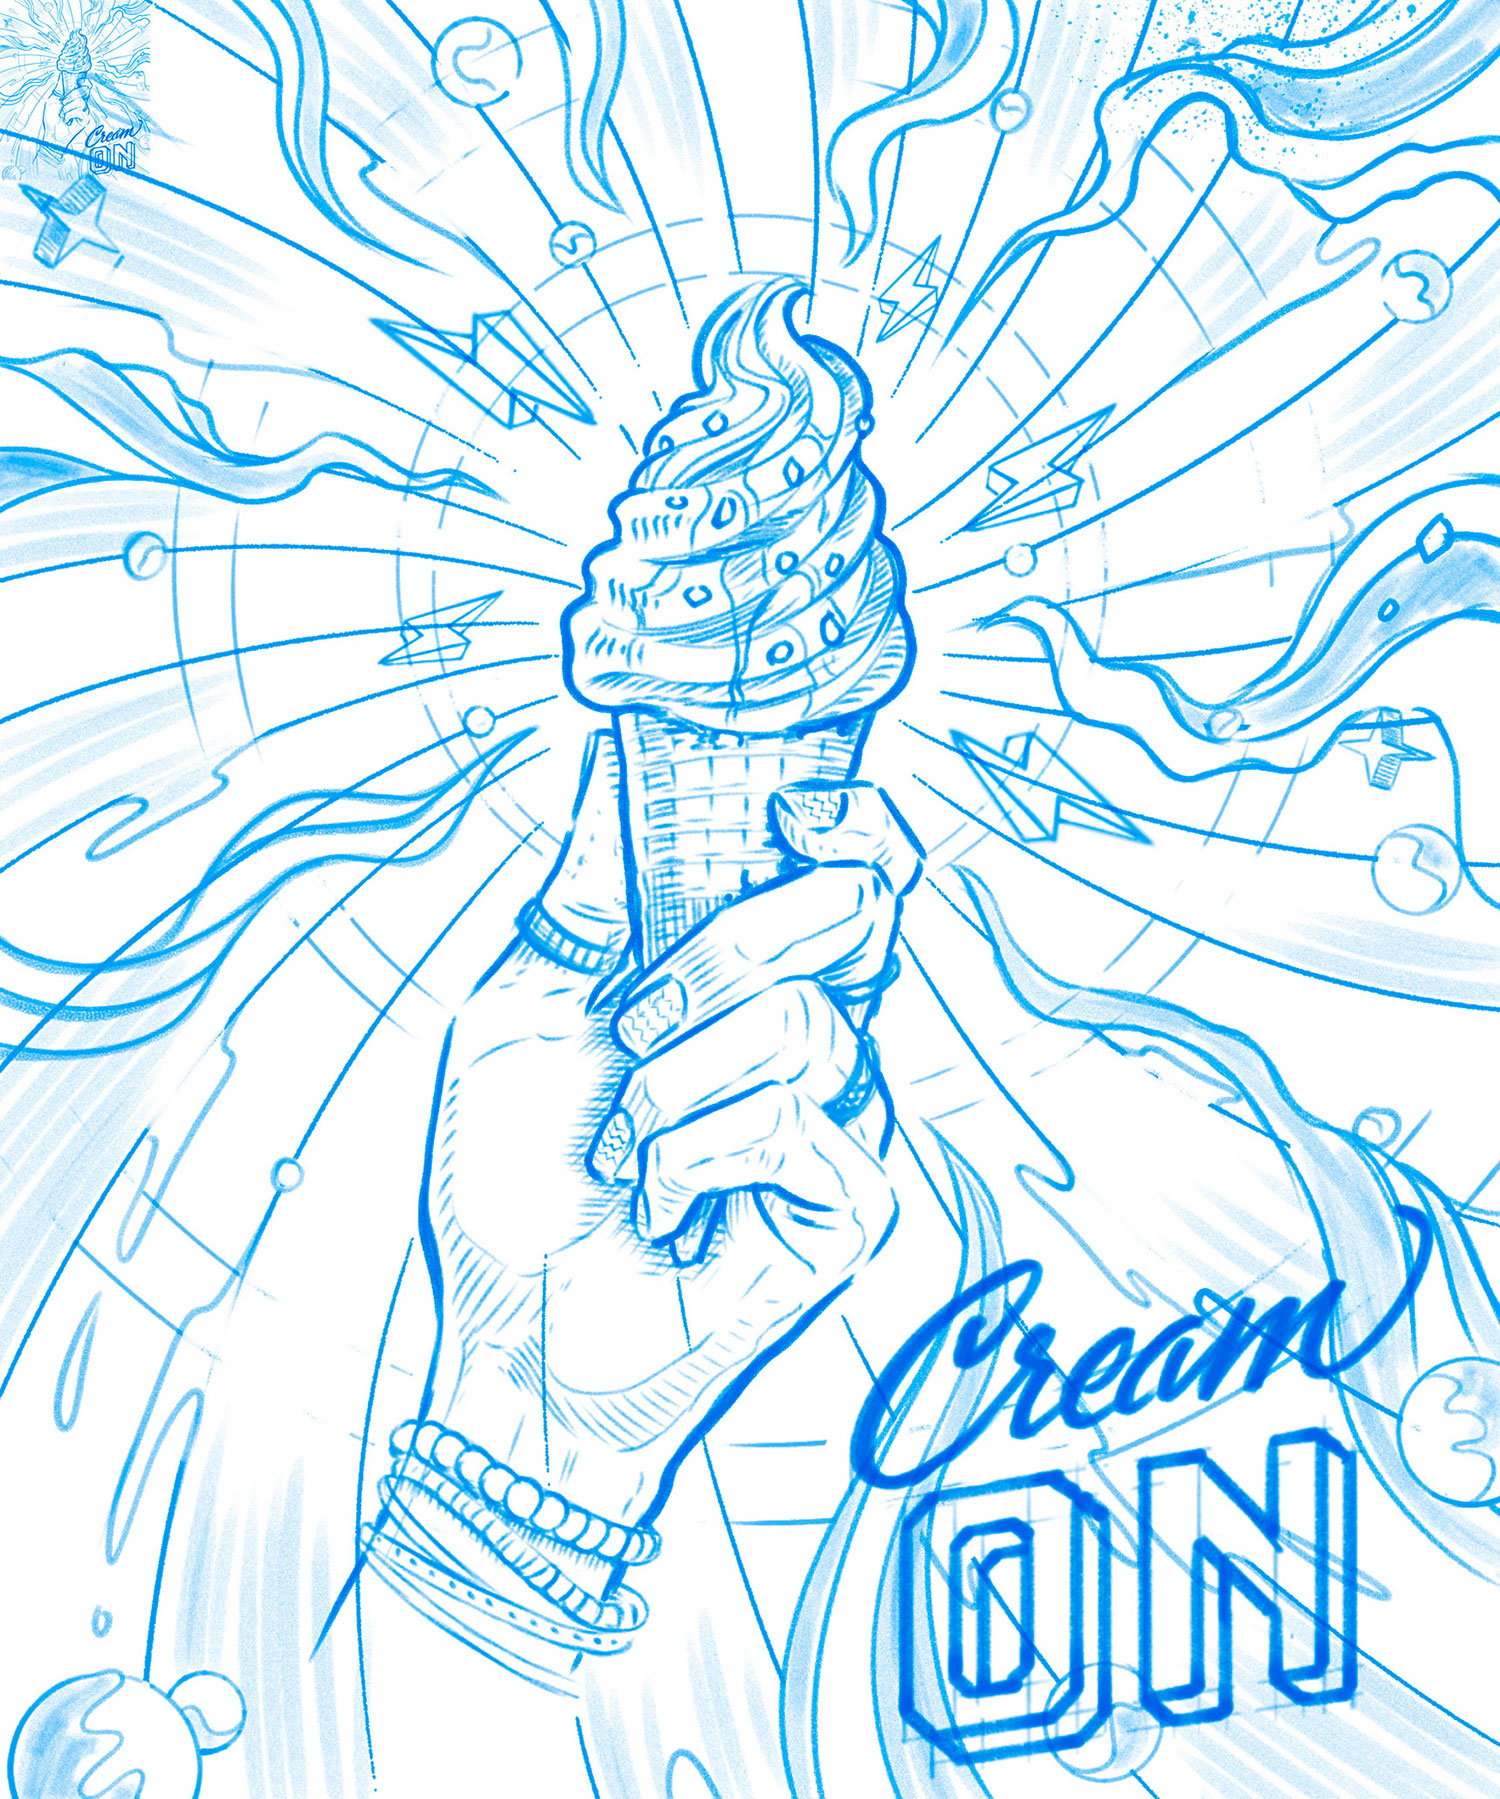 Poster-01-Cream-On-Sketch-copy.jpg